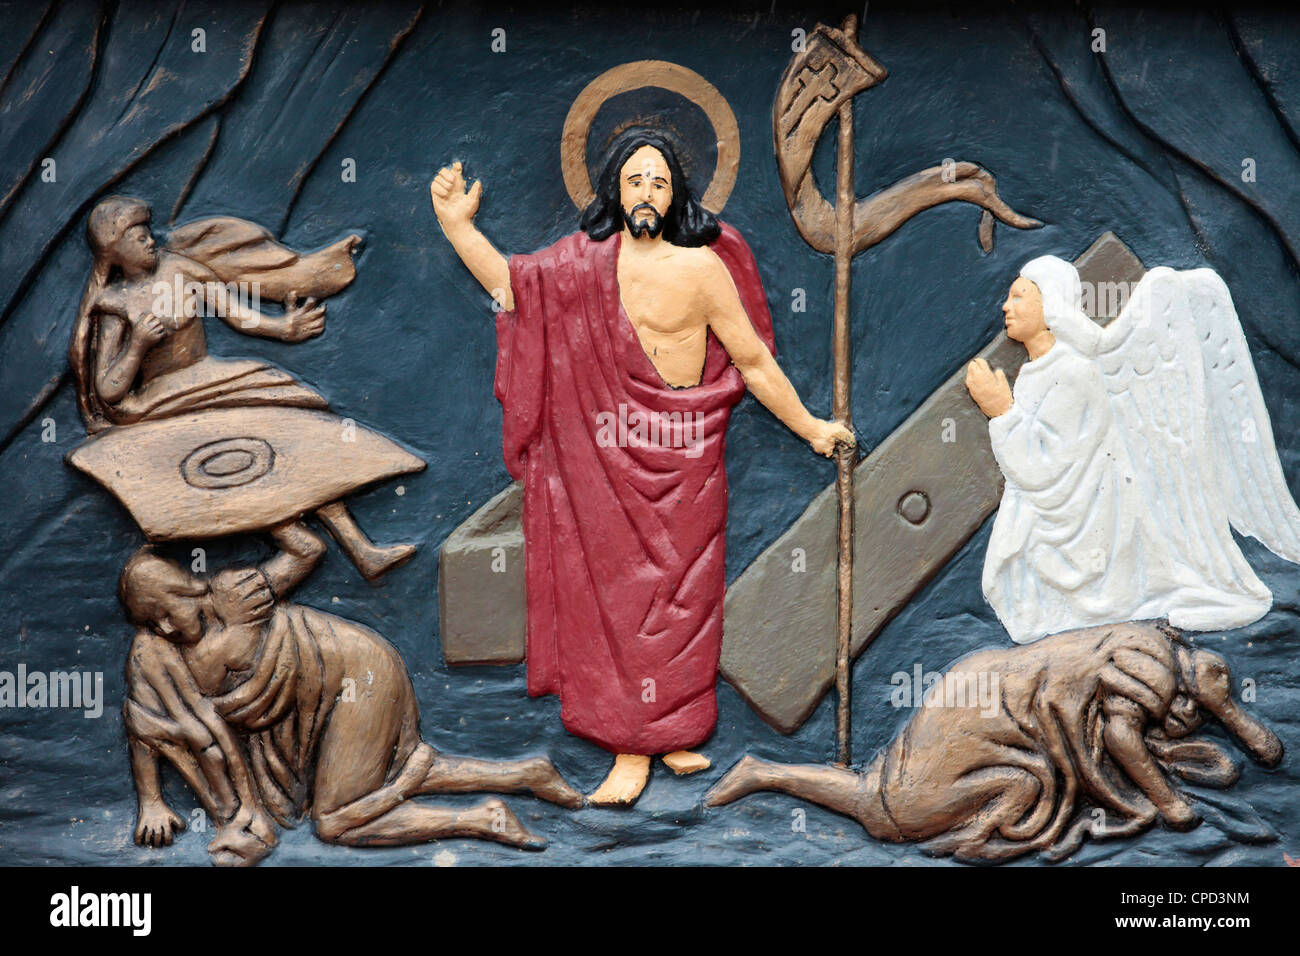 Christ's Resurrection, Ouidah, Benin, West Africa, Africa - Stock Image